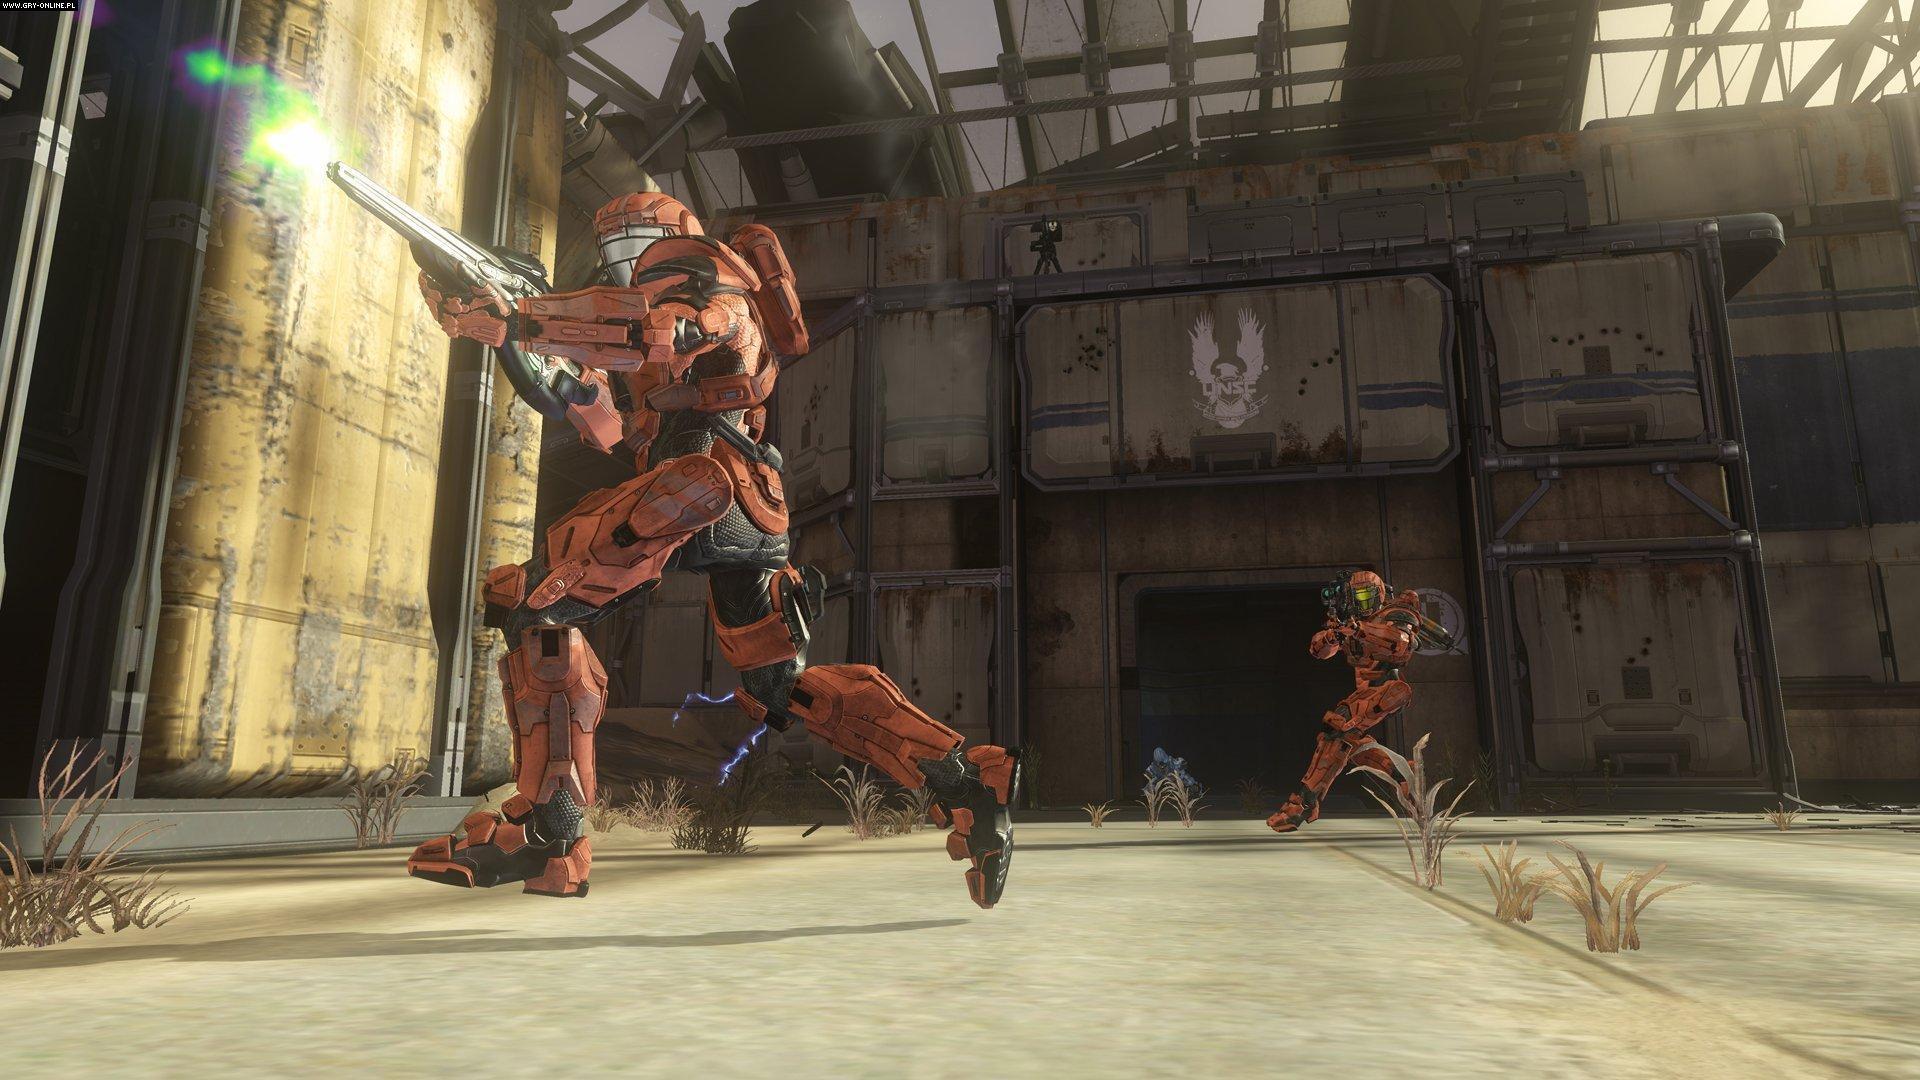 Halo 4 X360 Games Imag...